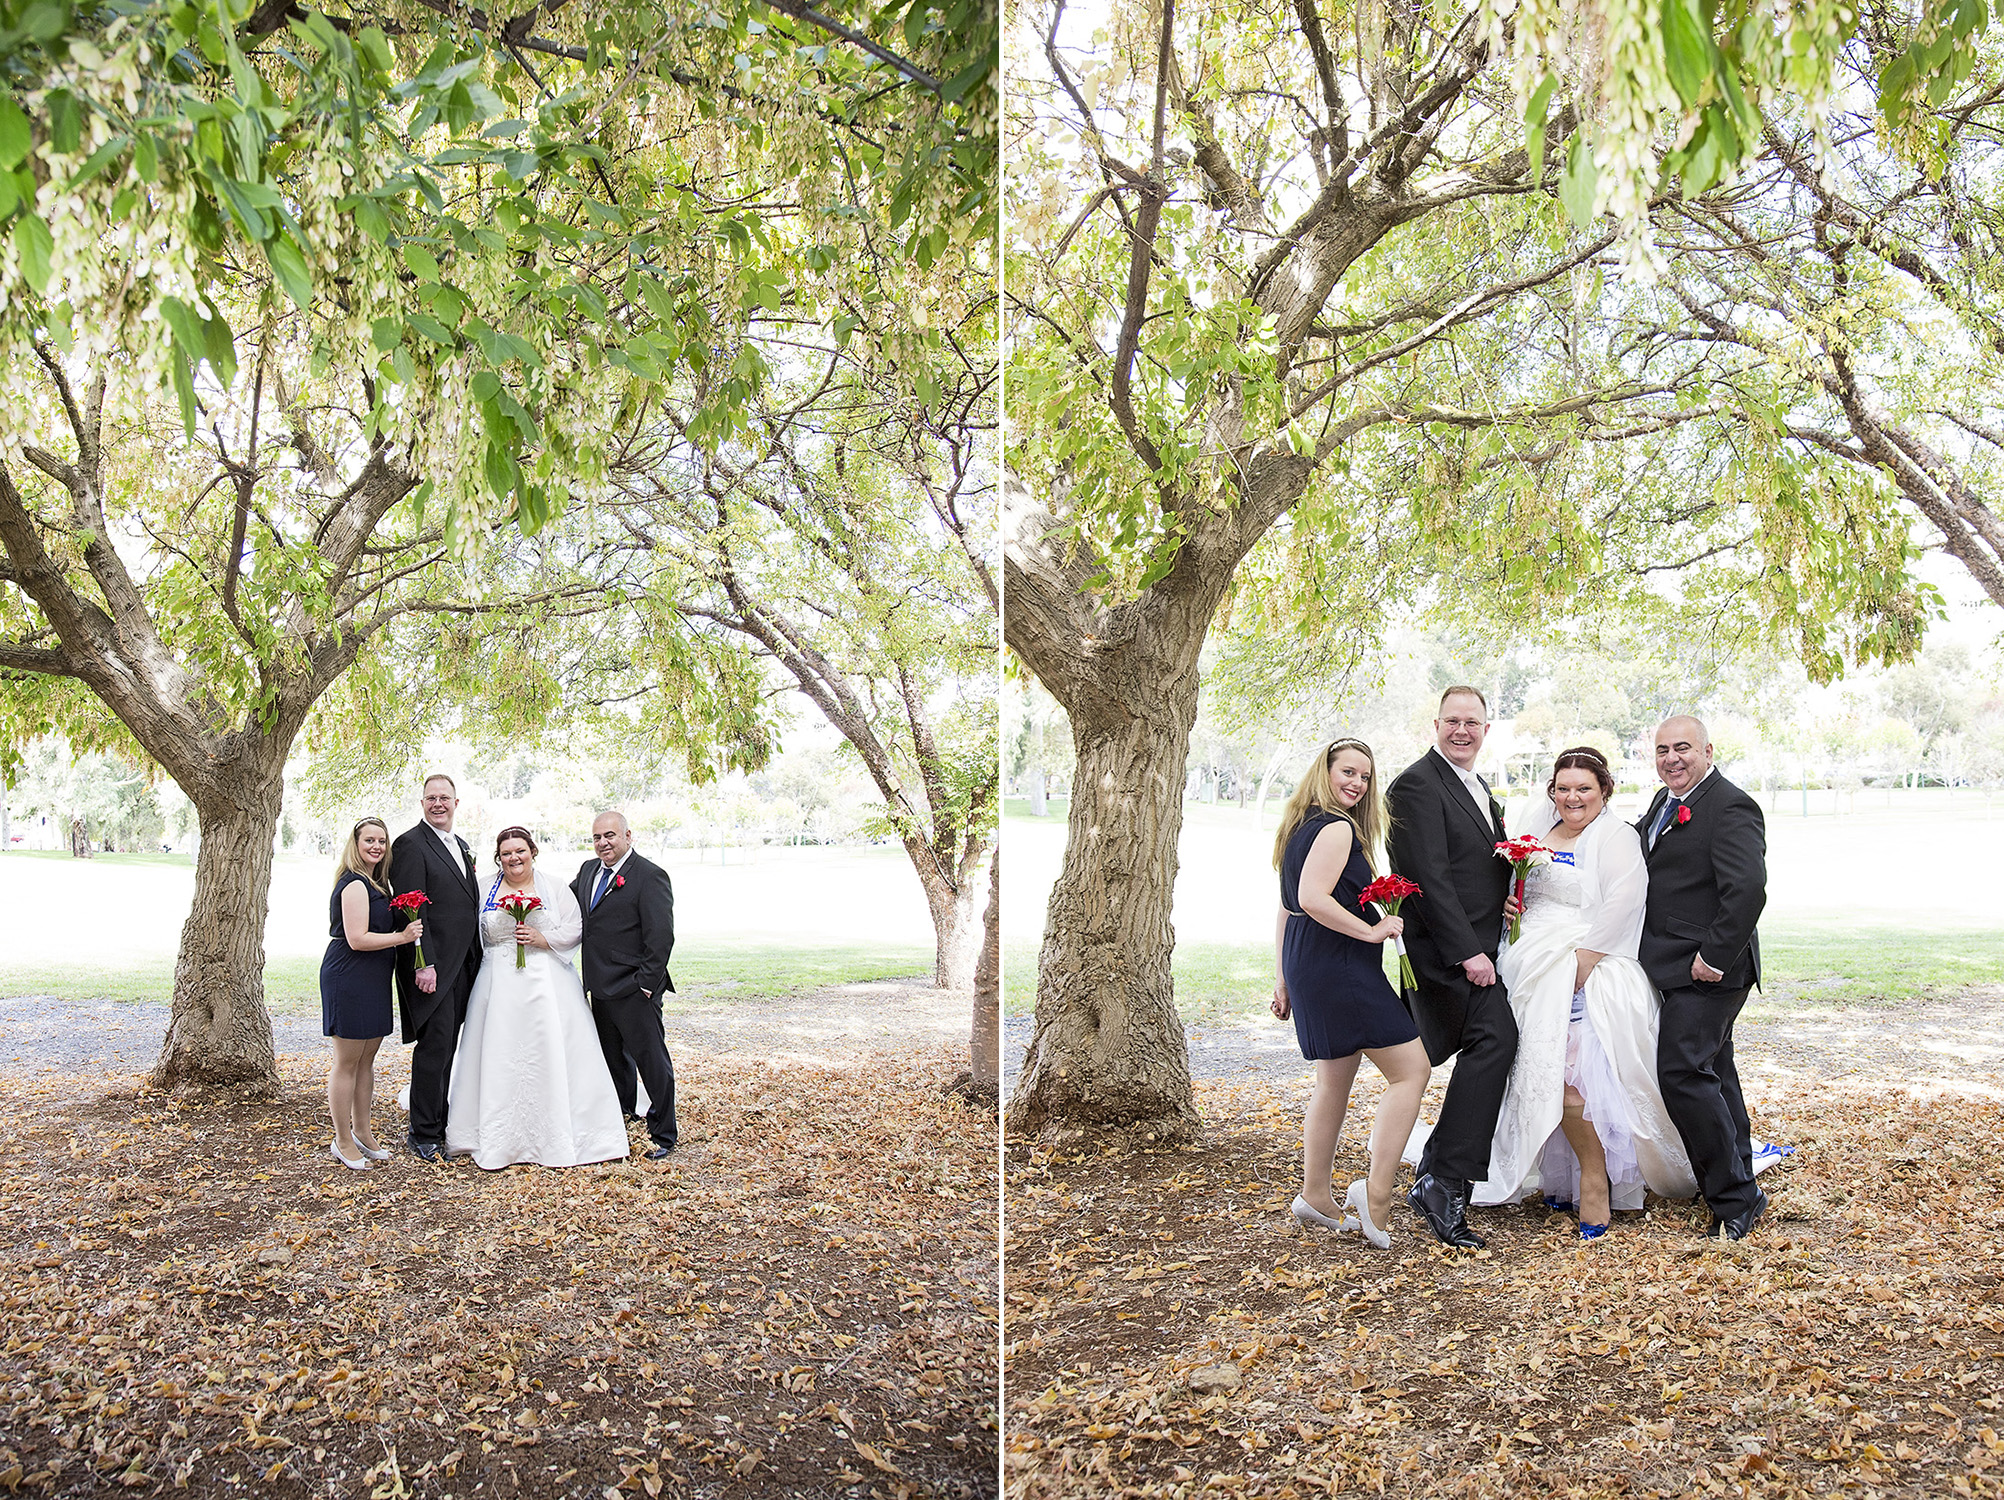 Sferas Modbury wedding 15.jpg